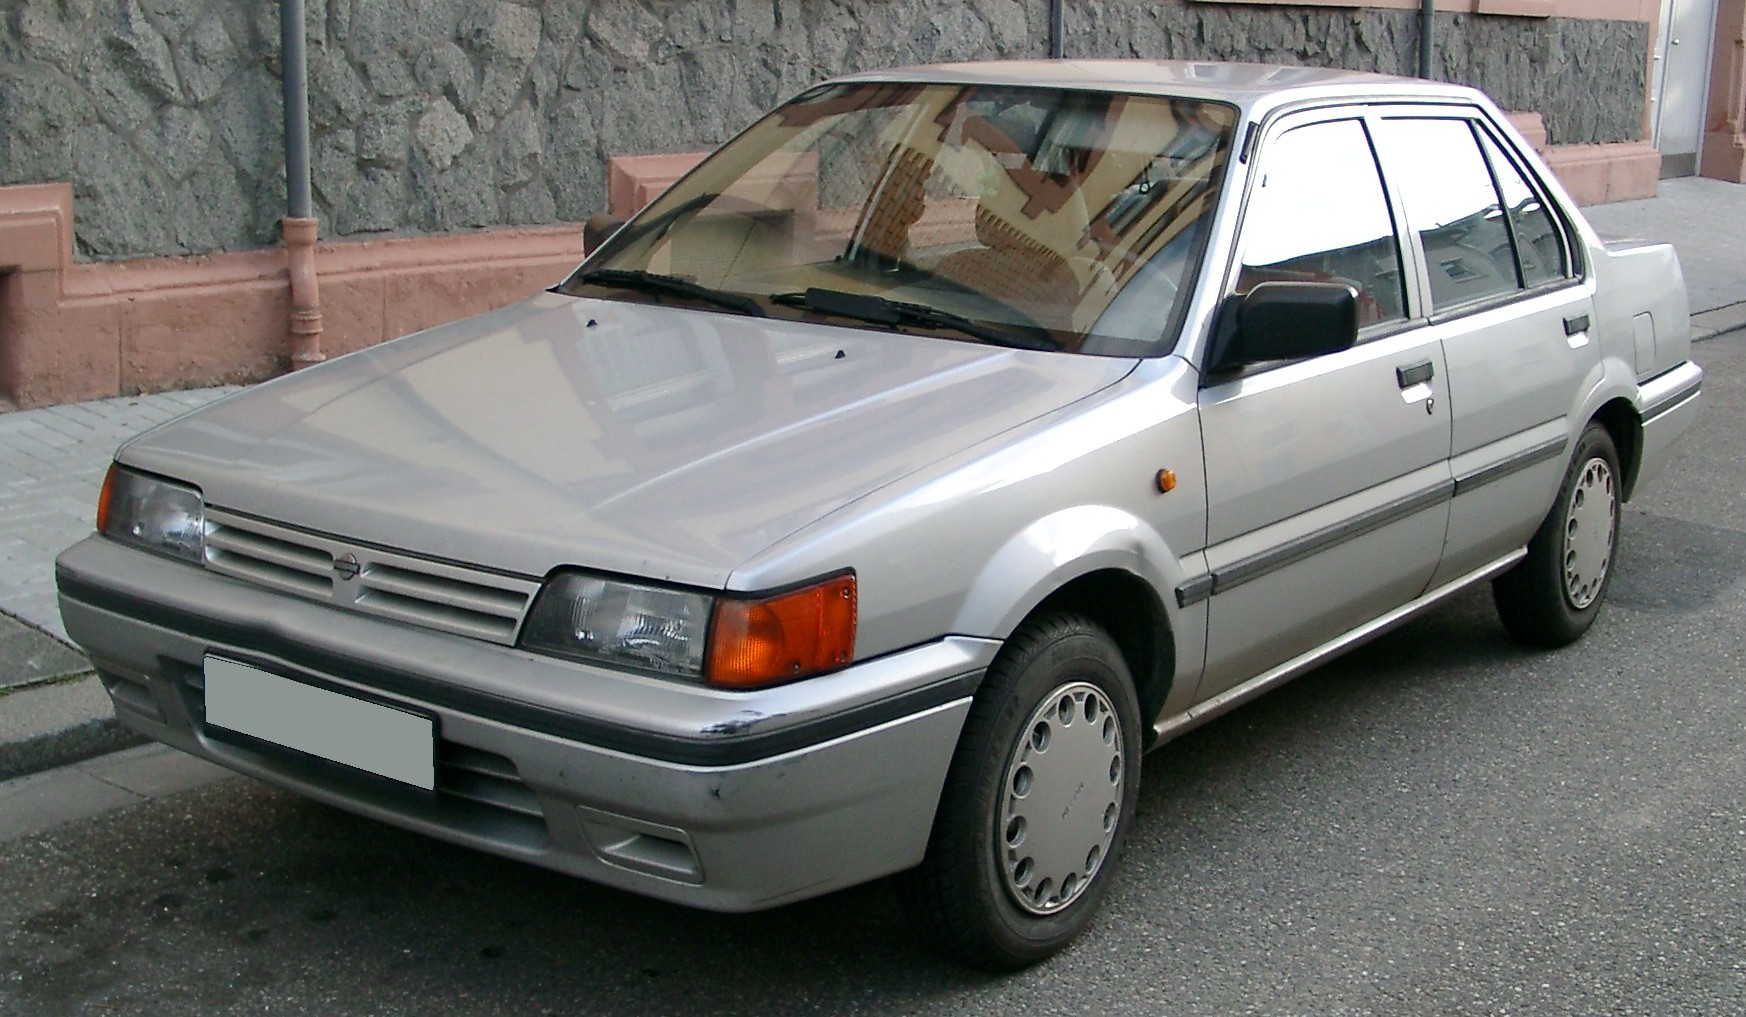 Nissan_Sunny_front_20071112.jpg